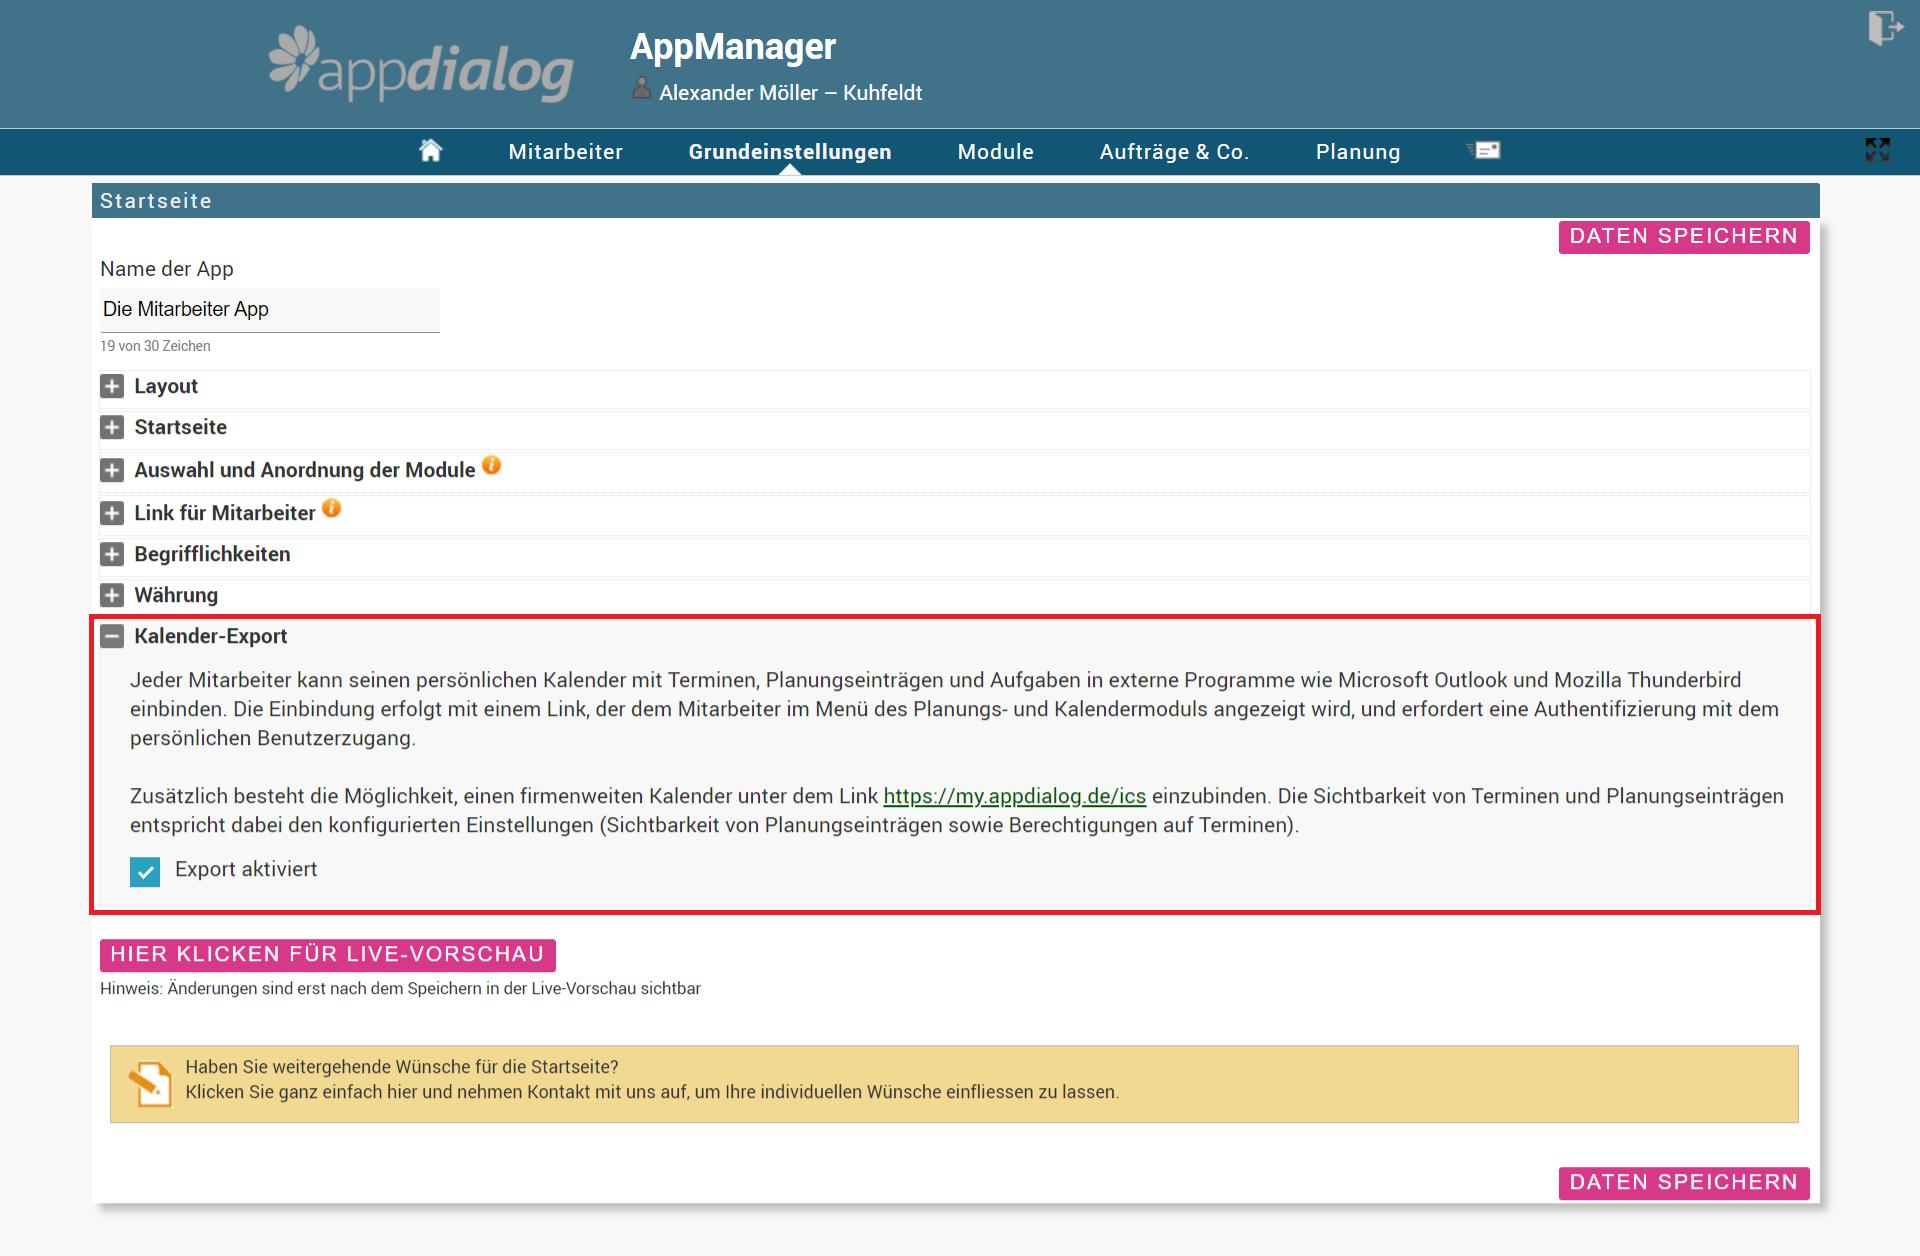 Aktivierung des Kalender Exports in der Web-Administration